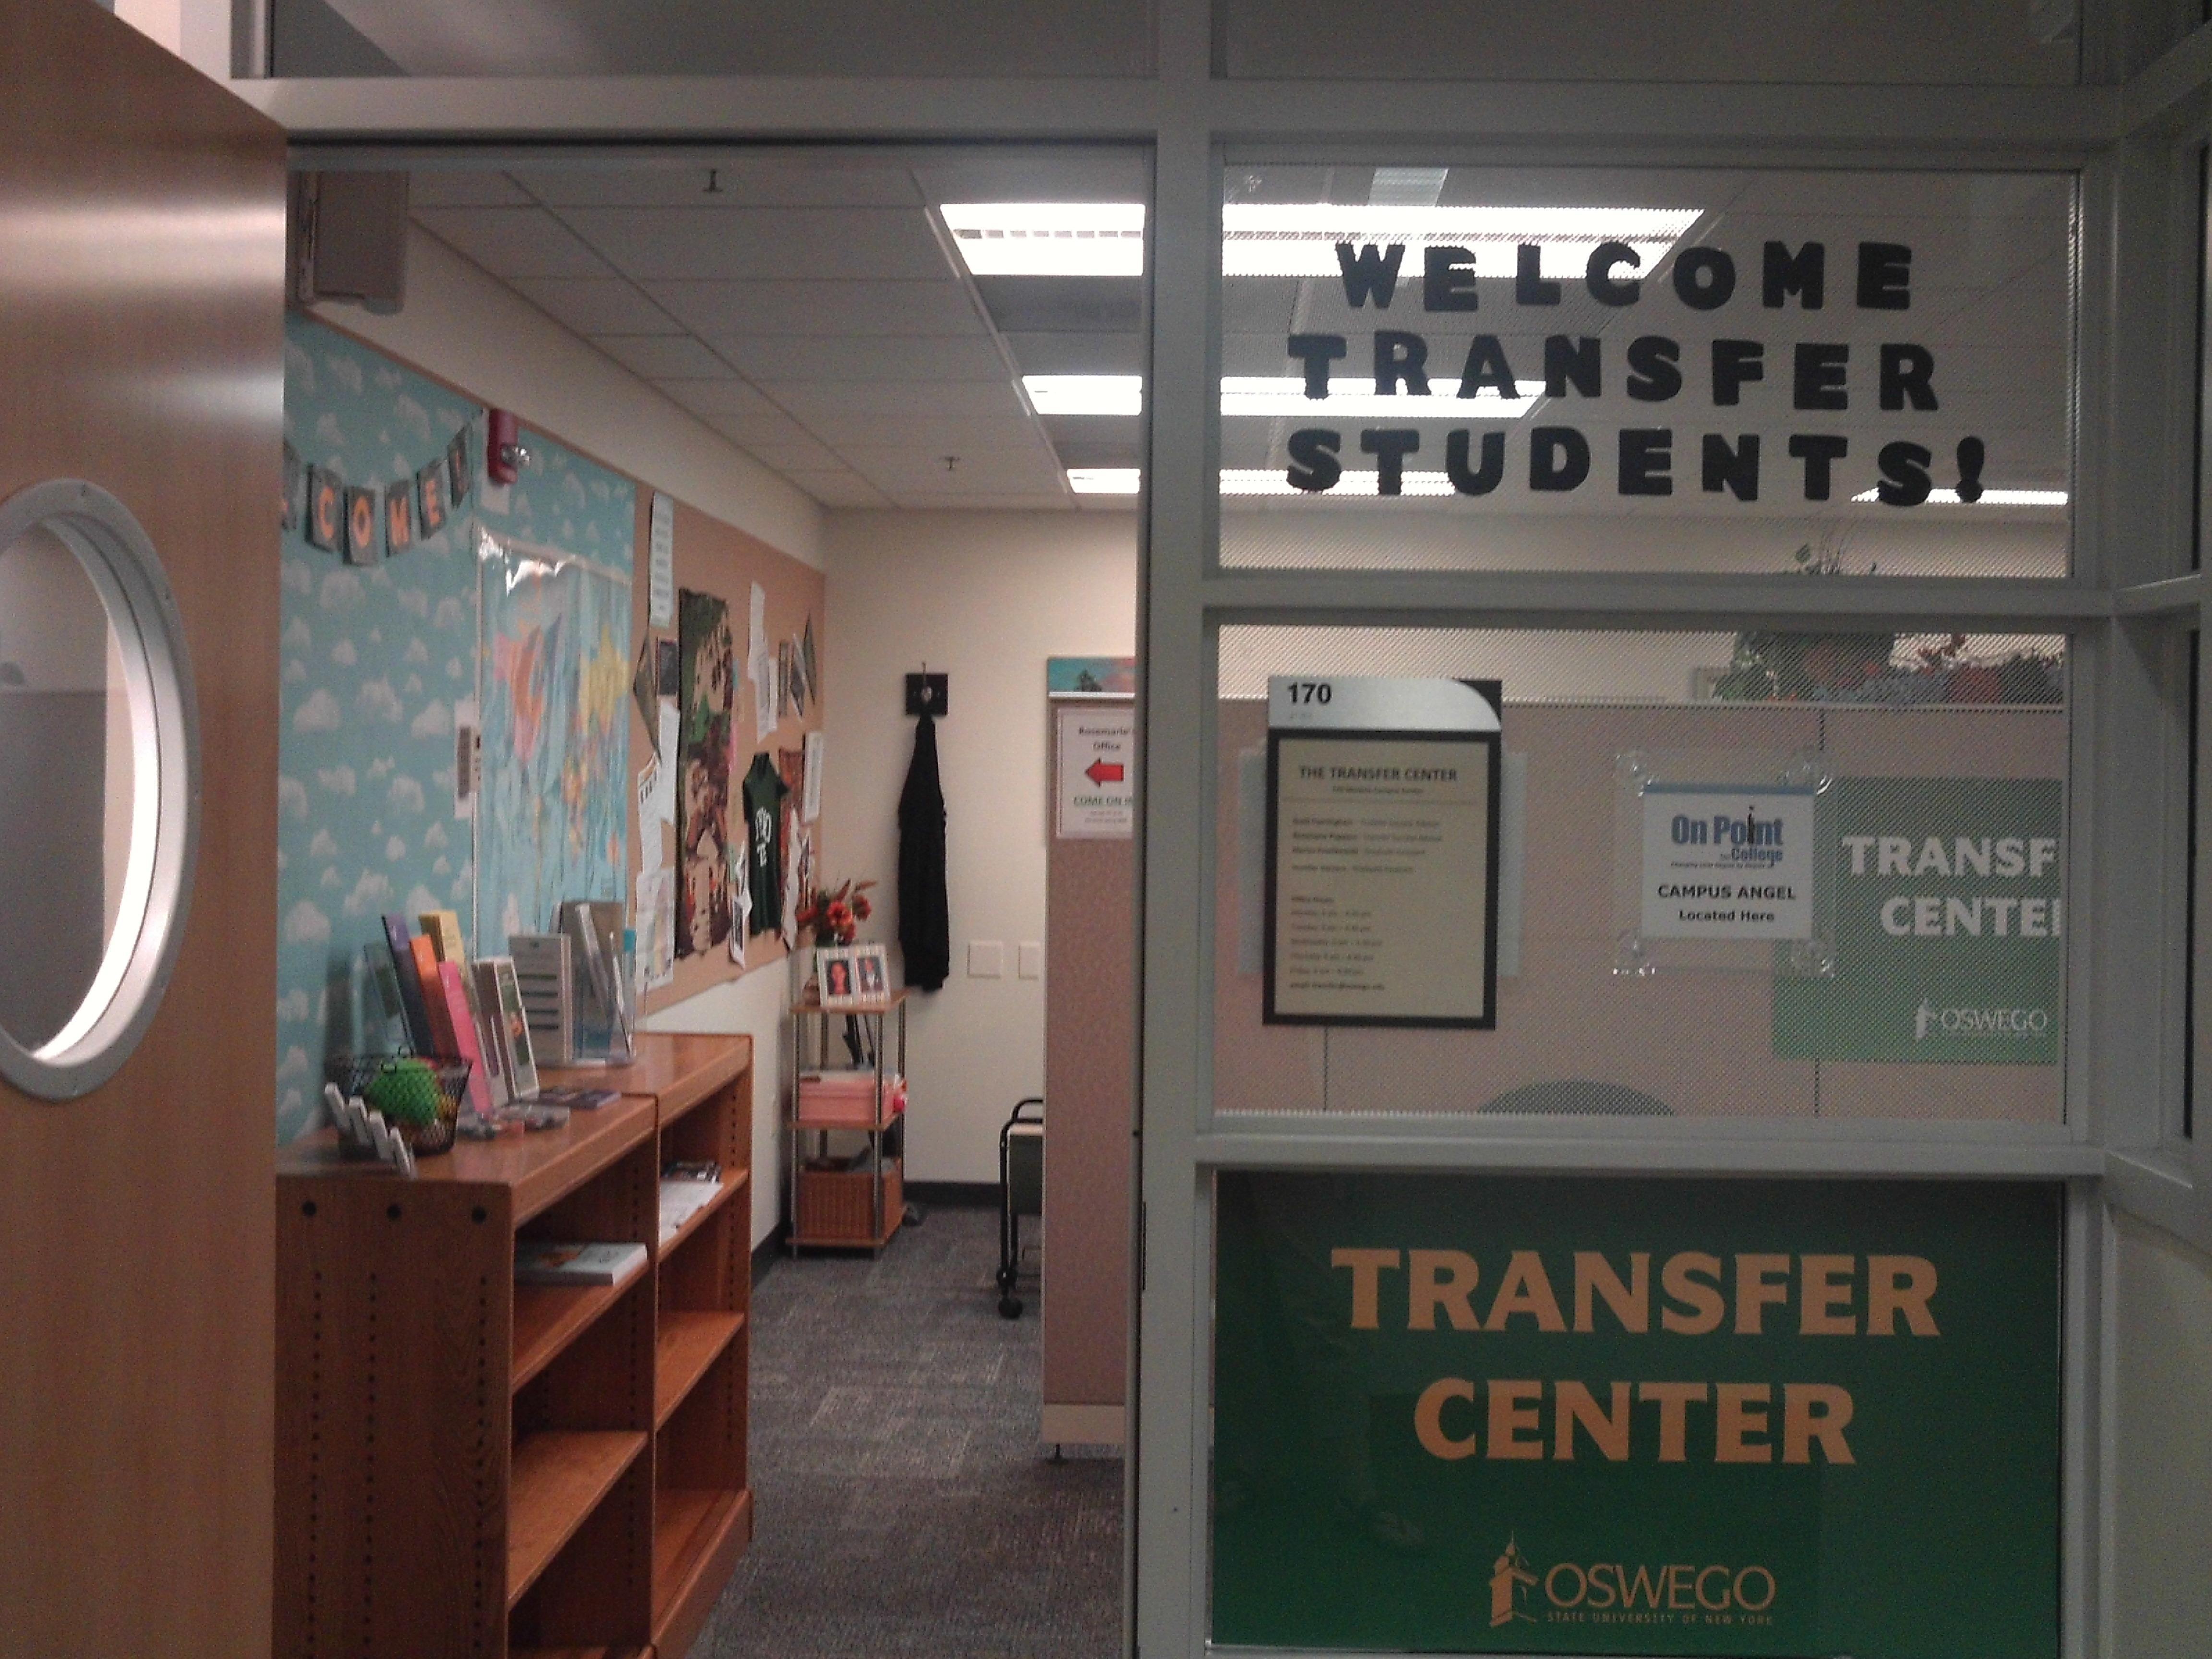 The Transfer Center